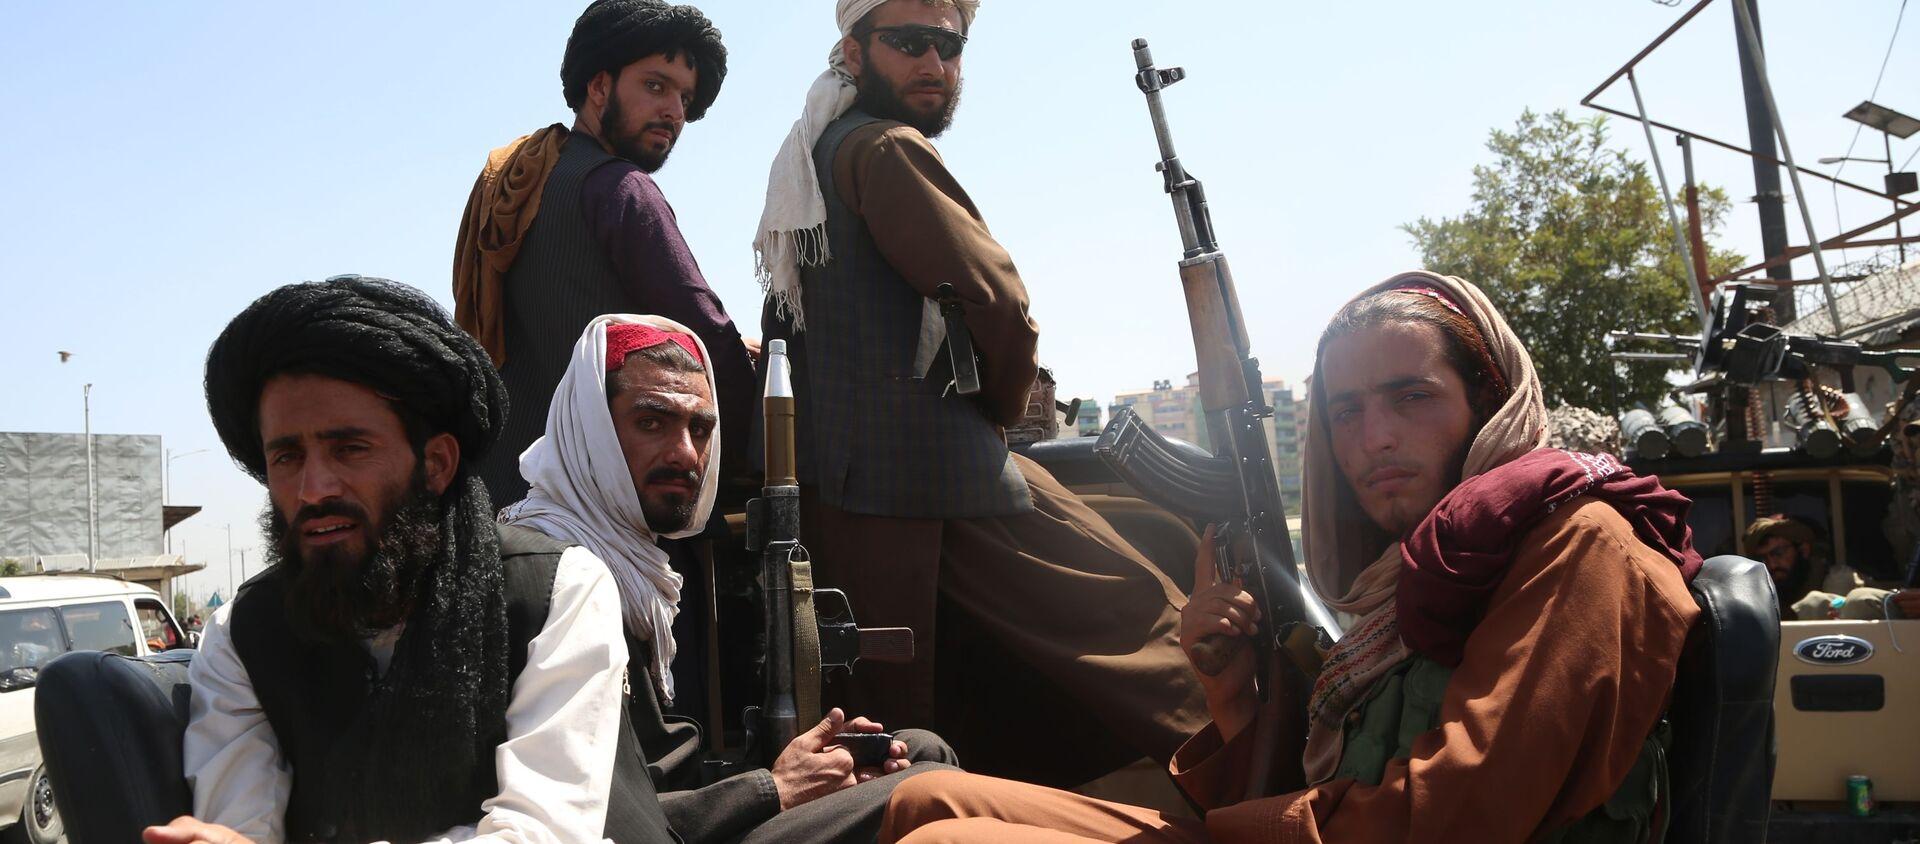 Taliban fighters in Kabul, Afghanistan, 16 August 2021 - Sputnik International, 1920, 20.08.2021